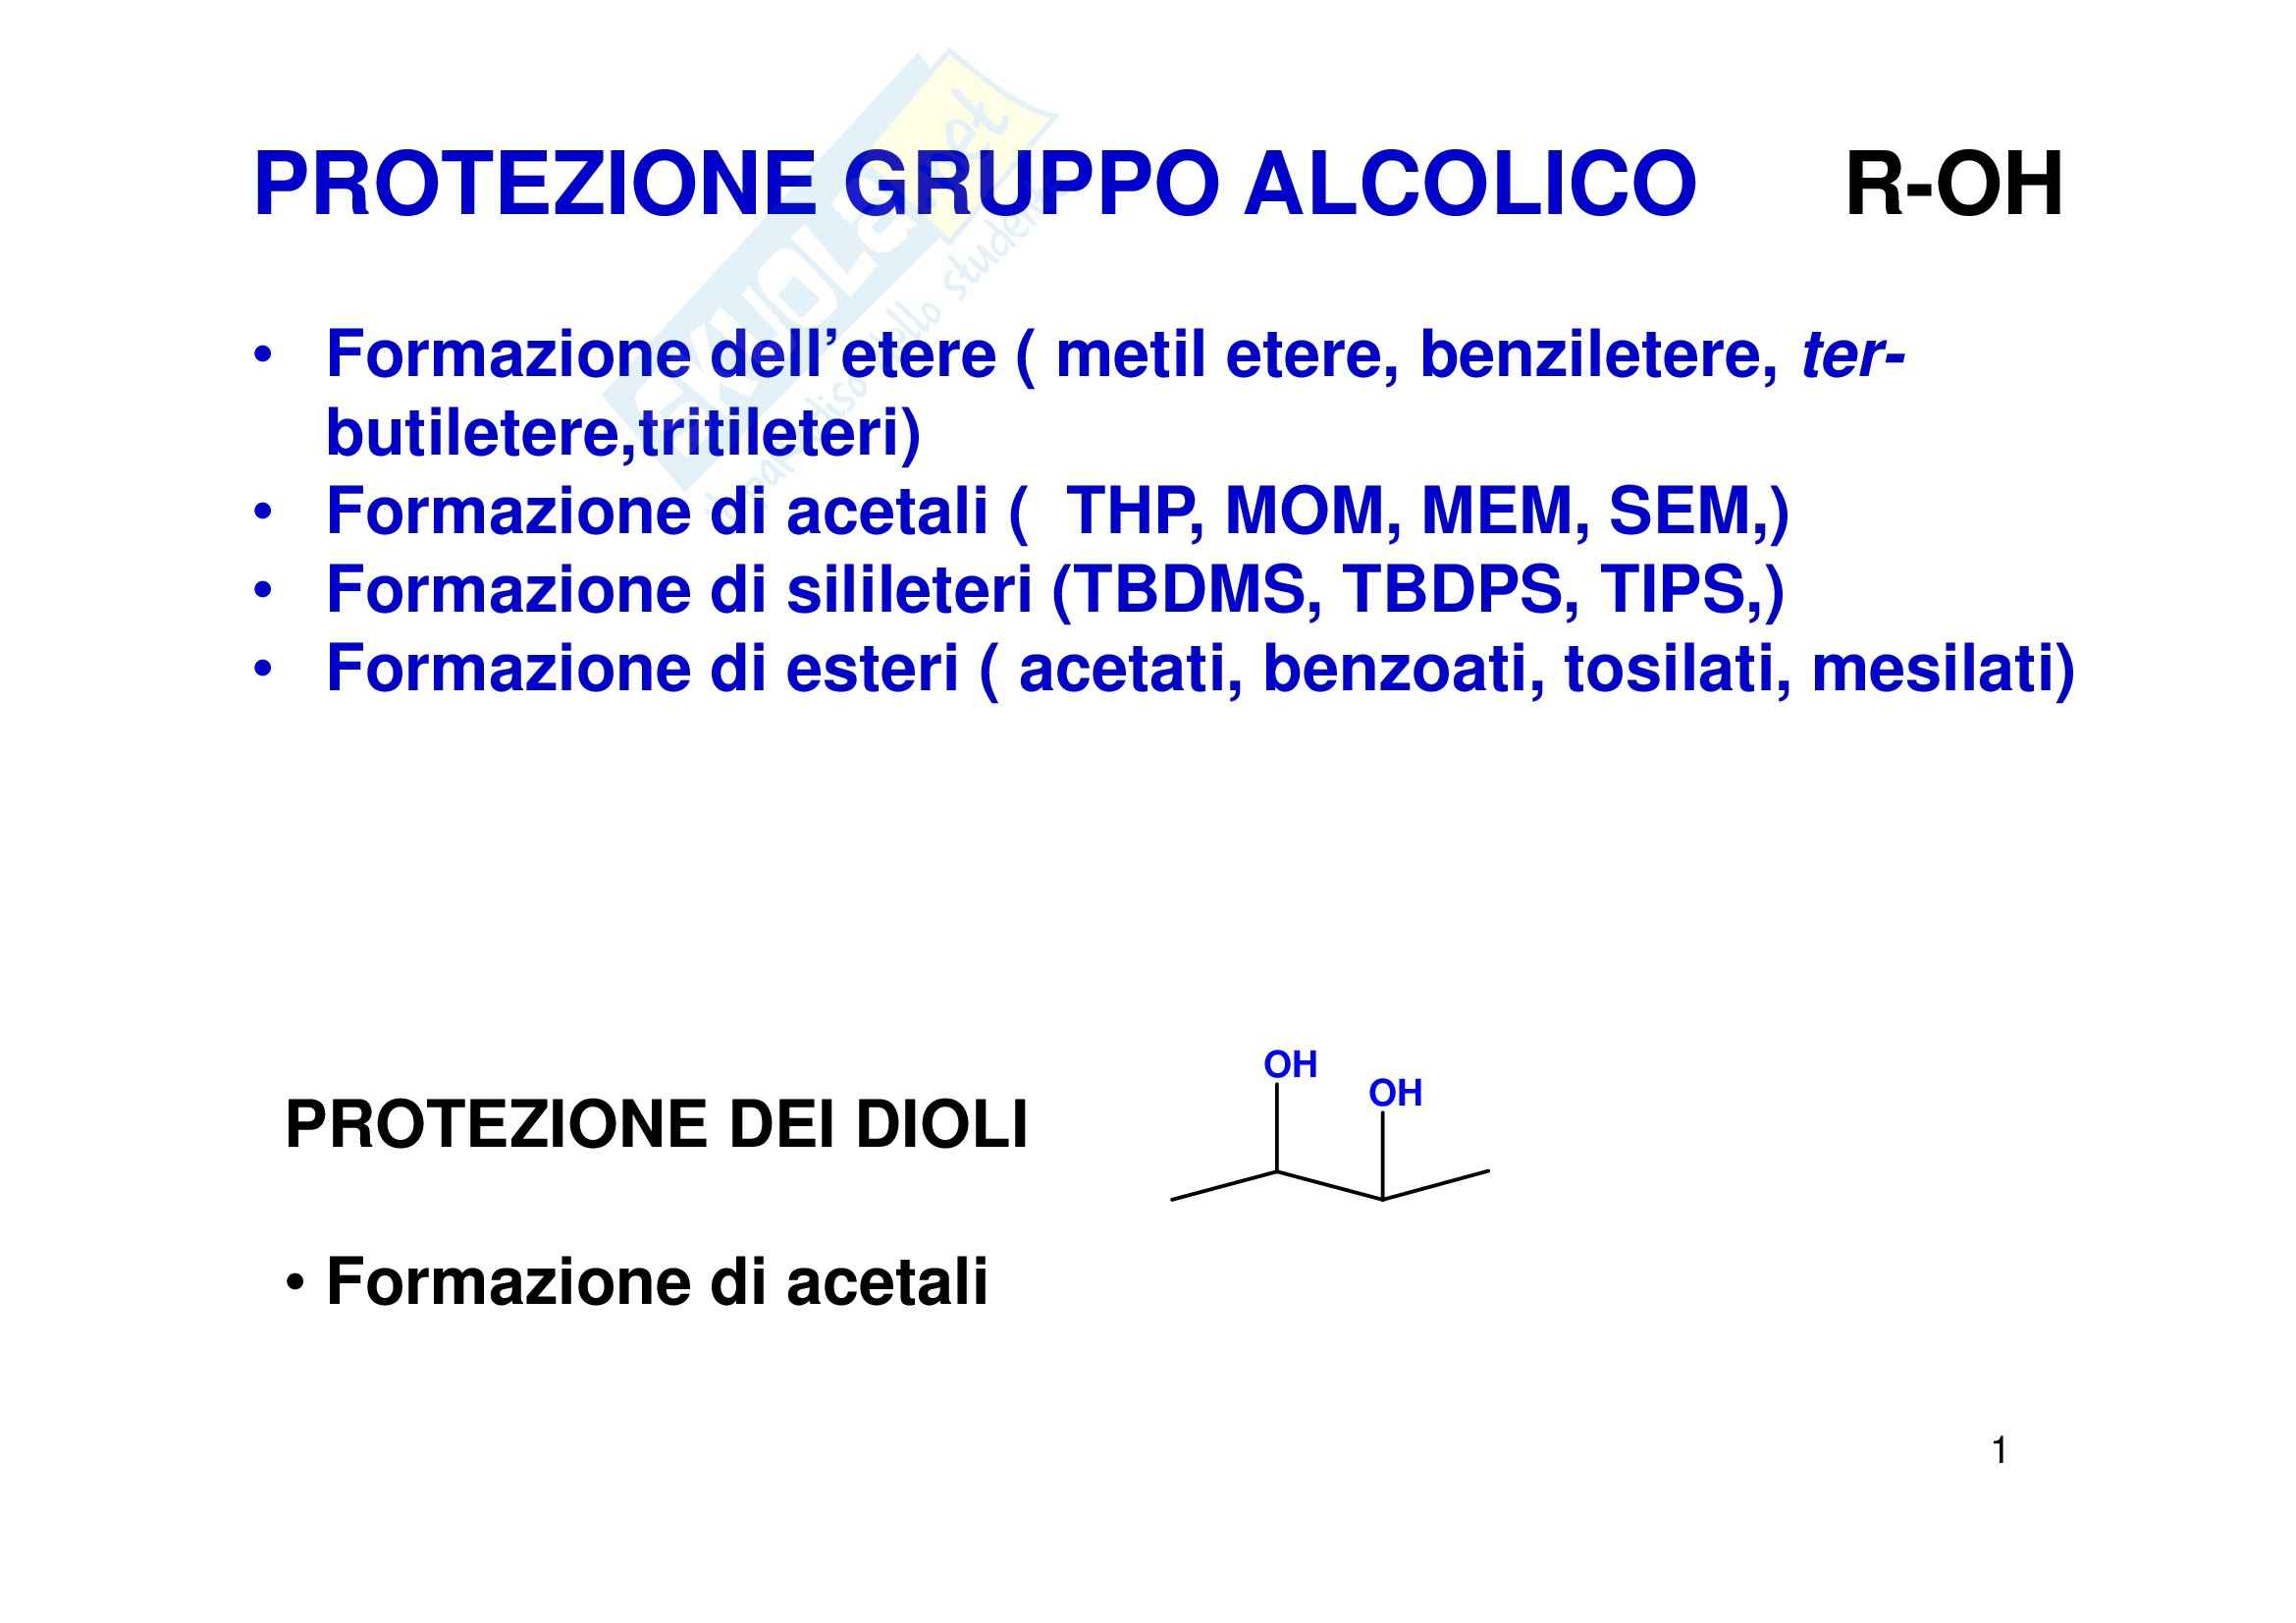 Chimica organica - gruppi protettori